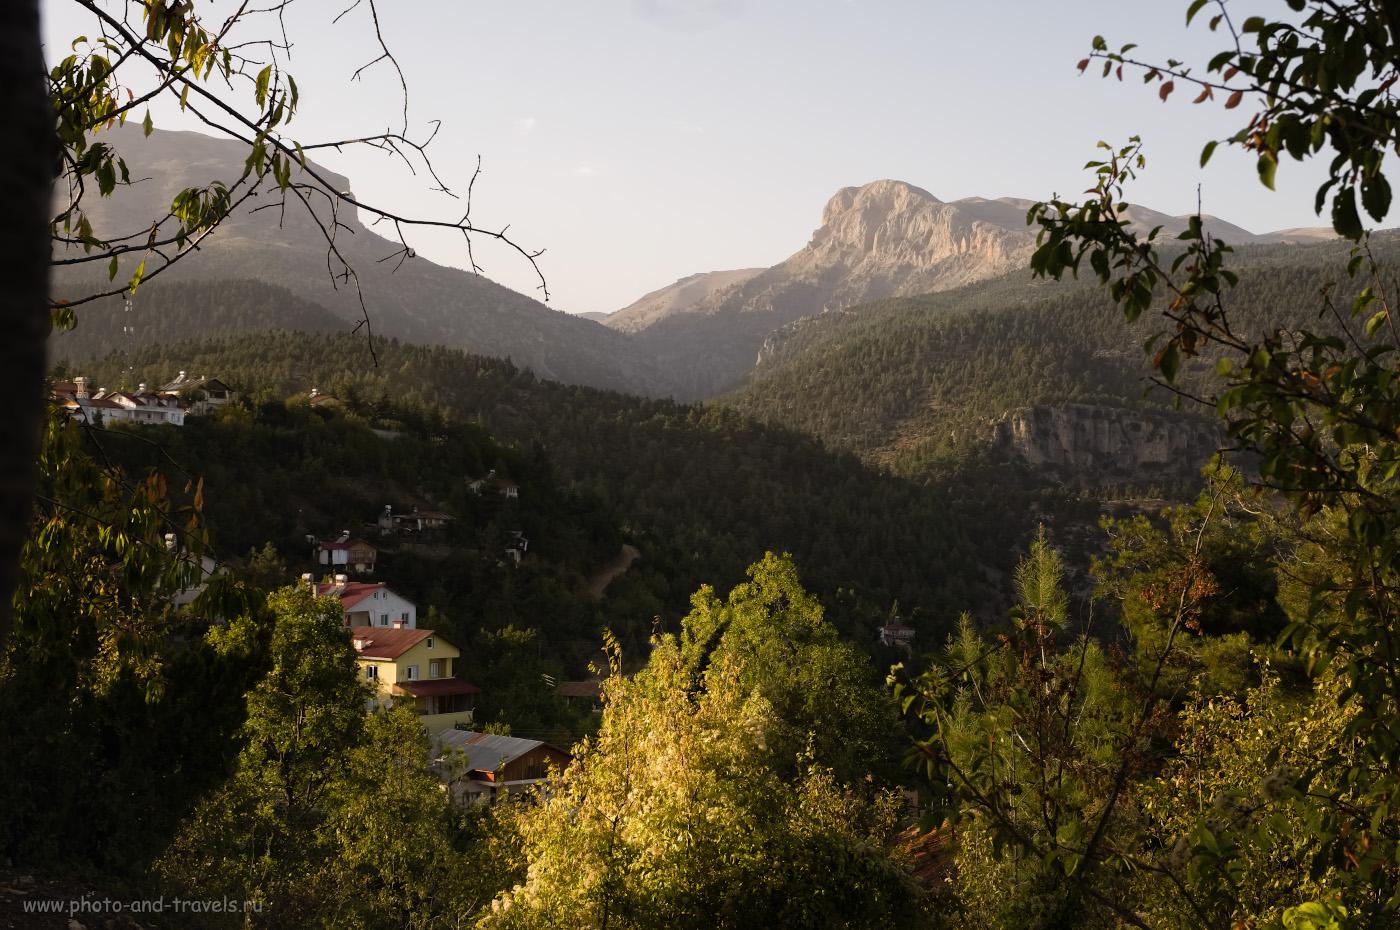 Фотография 8. Вид на горы Кюмбет (KümbetTepesi) справа (2473 метра) и Гёрюш (Görüş Tepesi) слева (2351 метр). Настройки: 1/80, 11.0, 200, -0.67, 24.